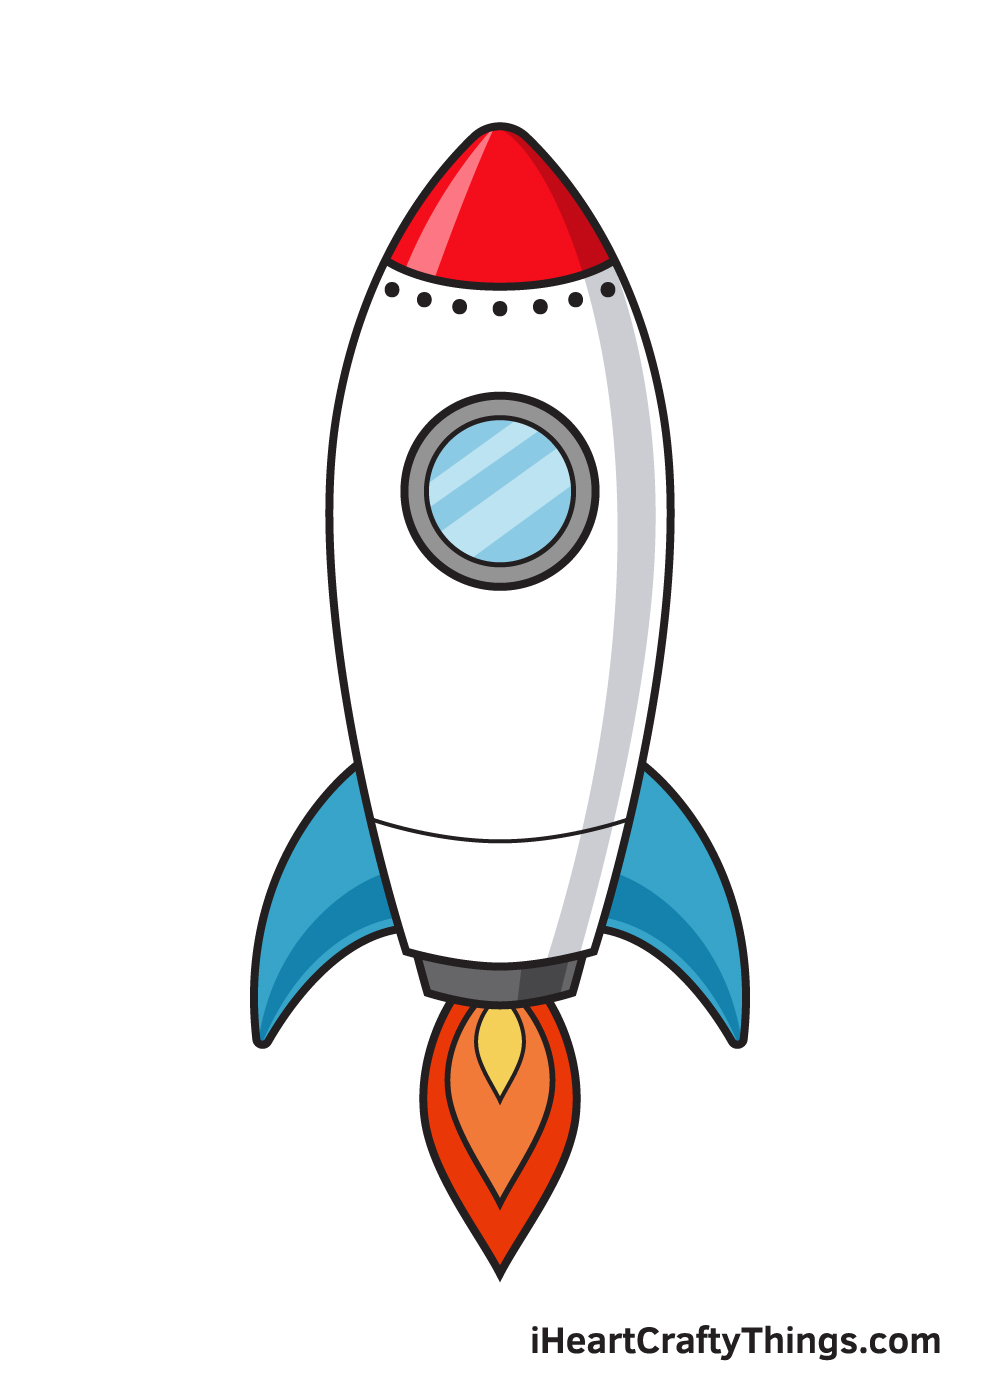 rocket drawing 9 steps